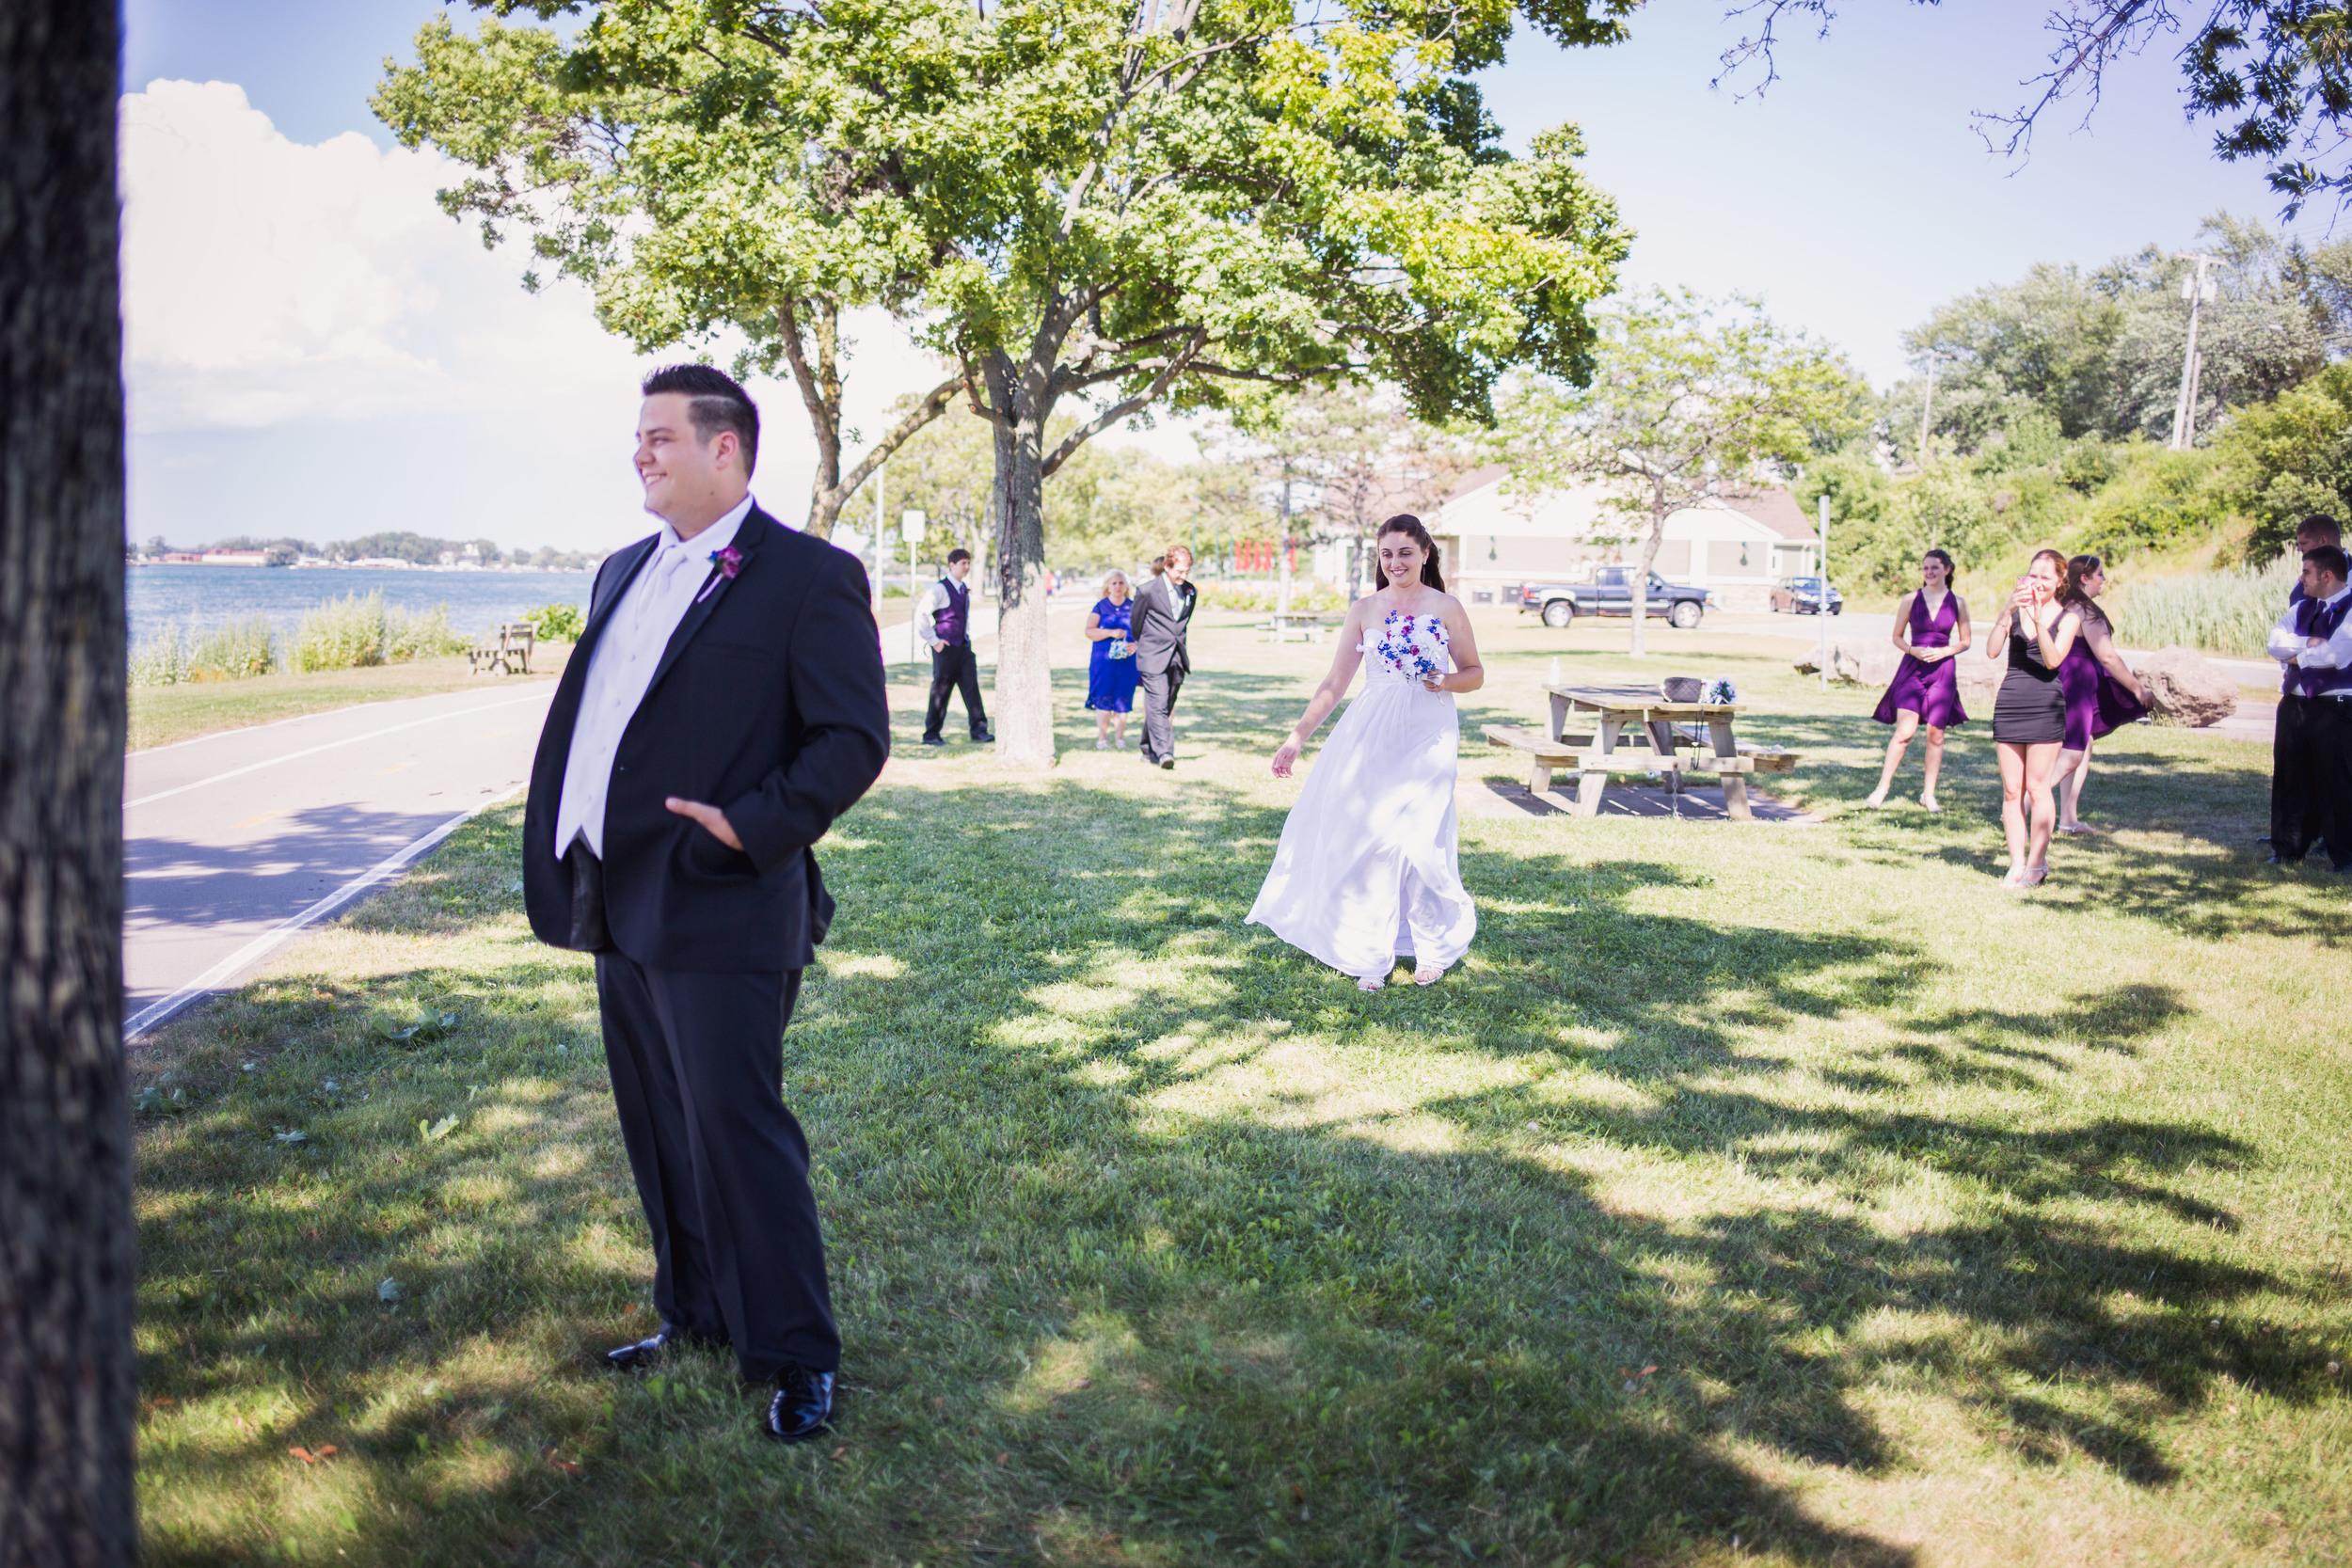 Stephanie-and-Mitchell-Buffalo-NY-Wedding-Stefan-Ludwig-Photography-5.jpg